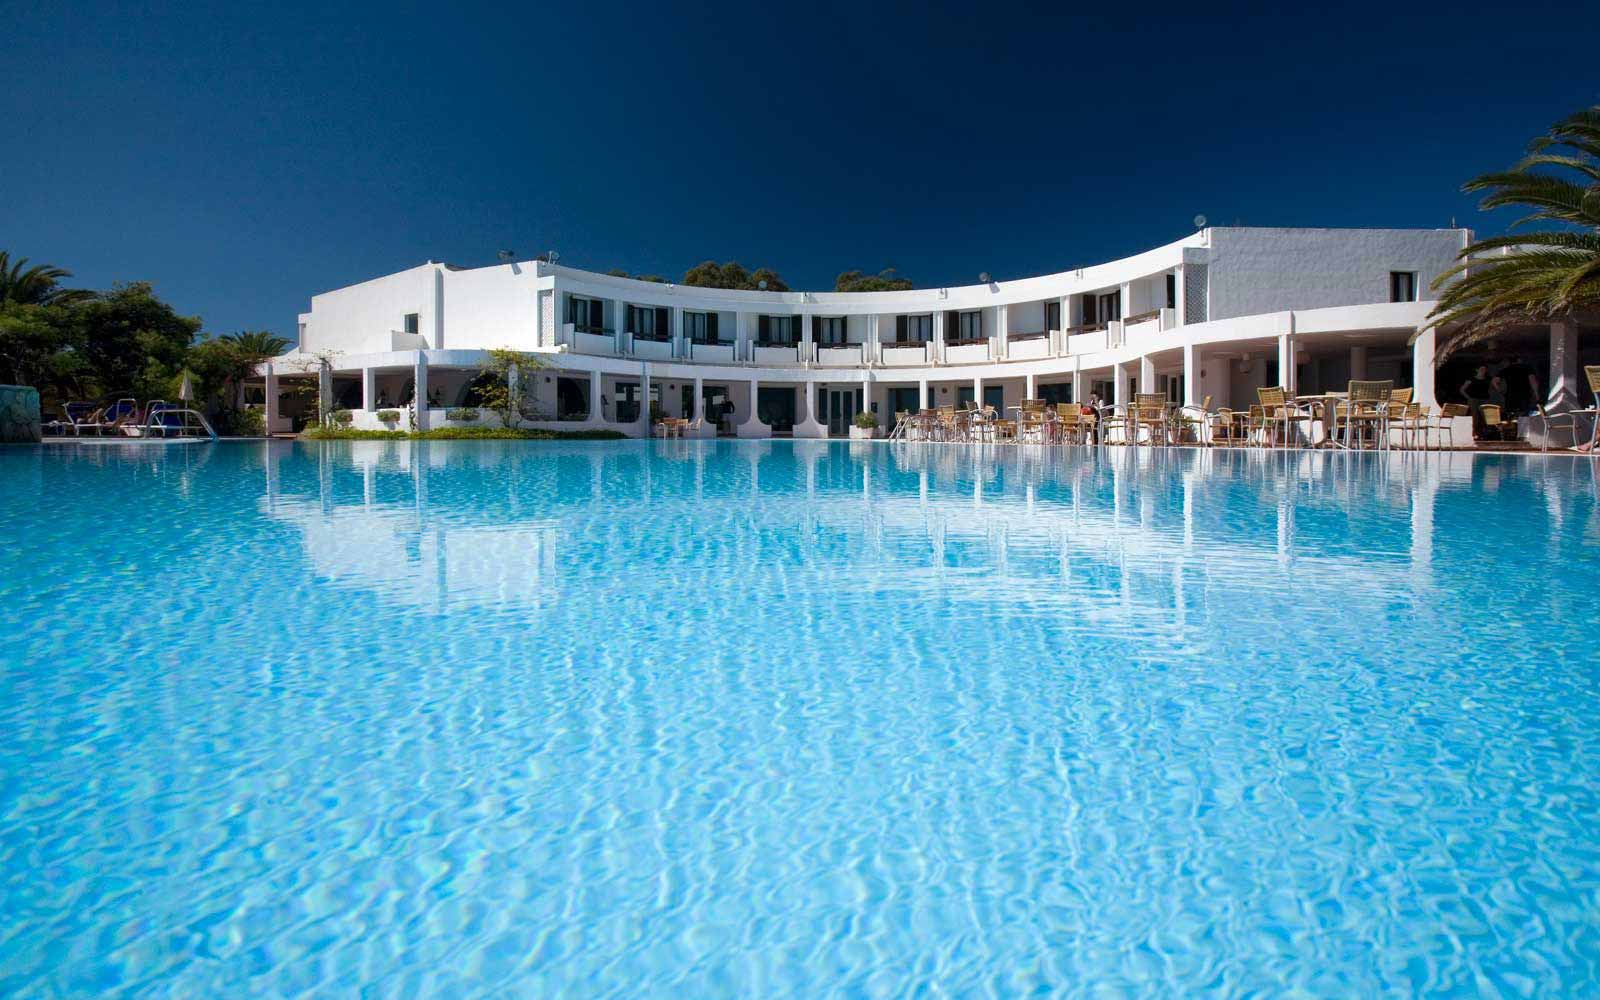 Hotel flamingo santa margherita di pula sardinia 4 - Hotels in catania with swimming pool ...